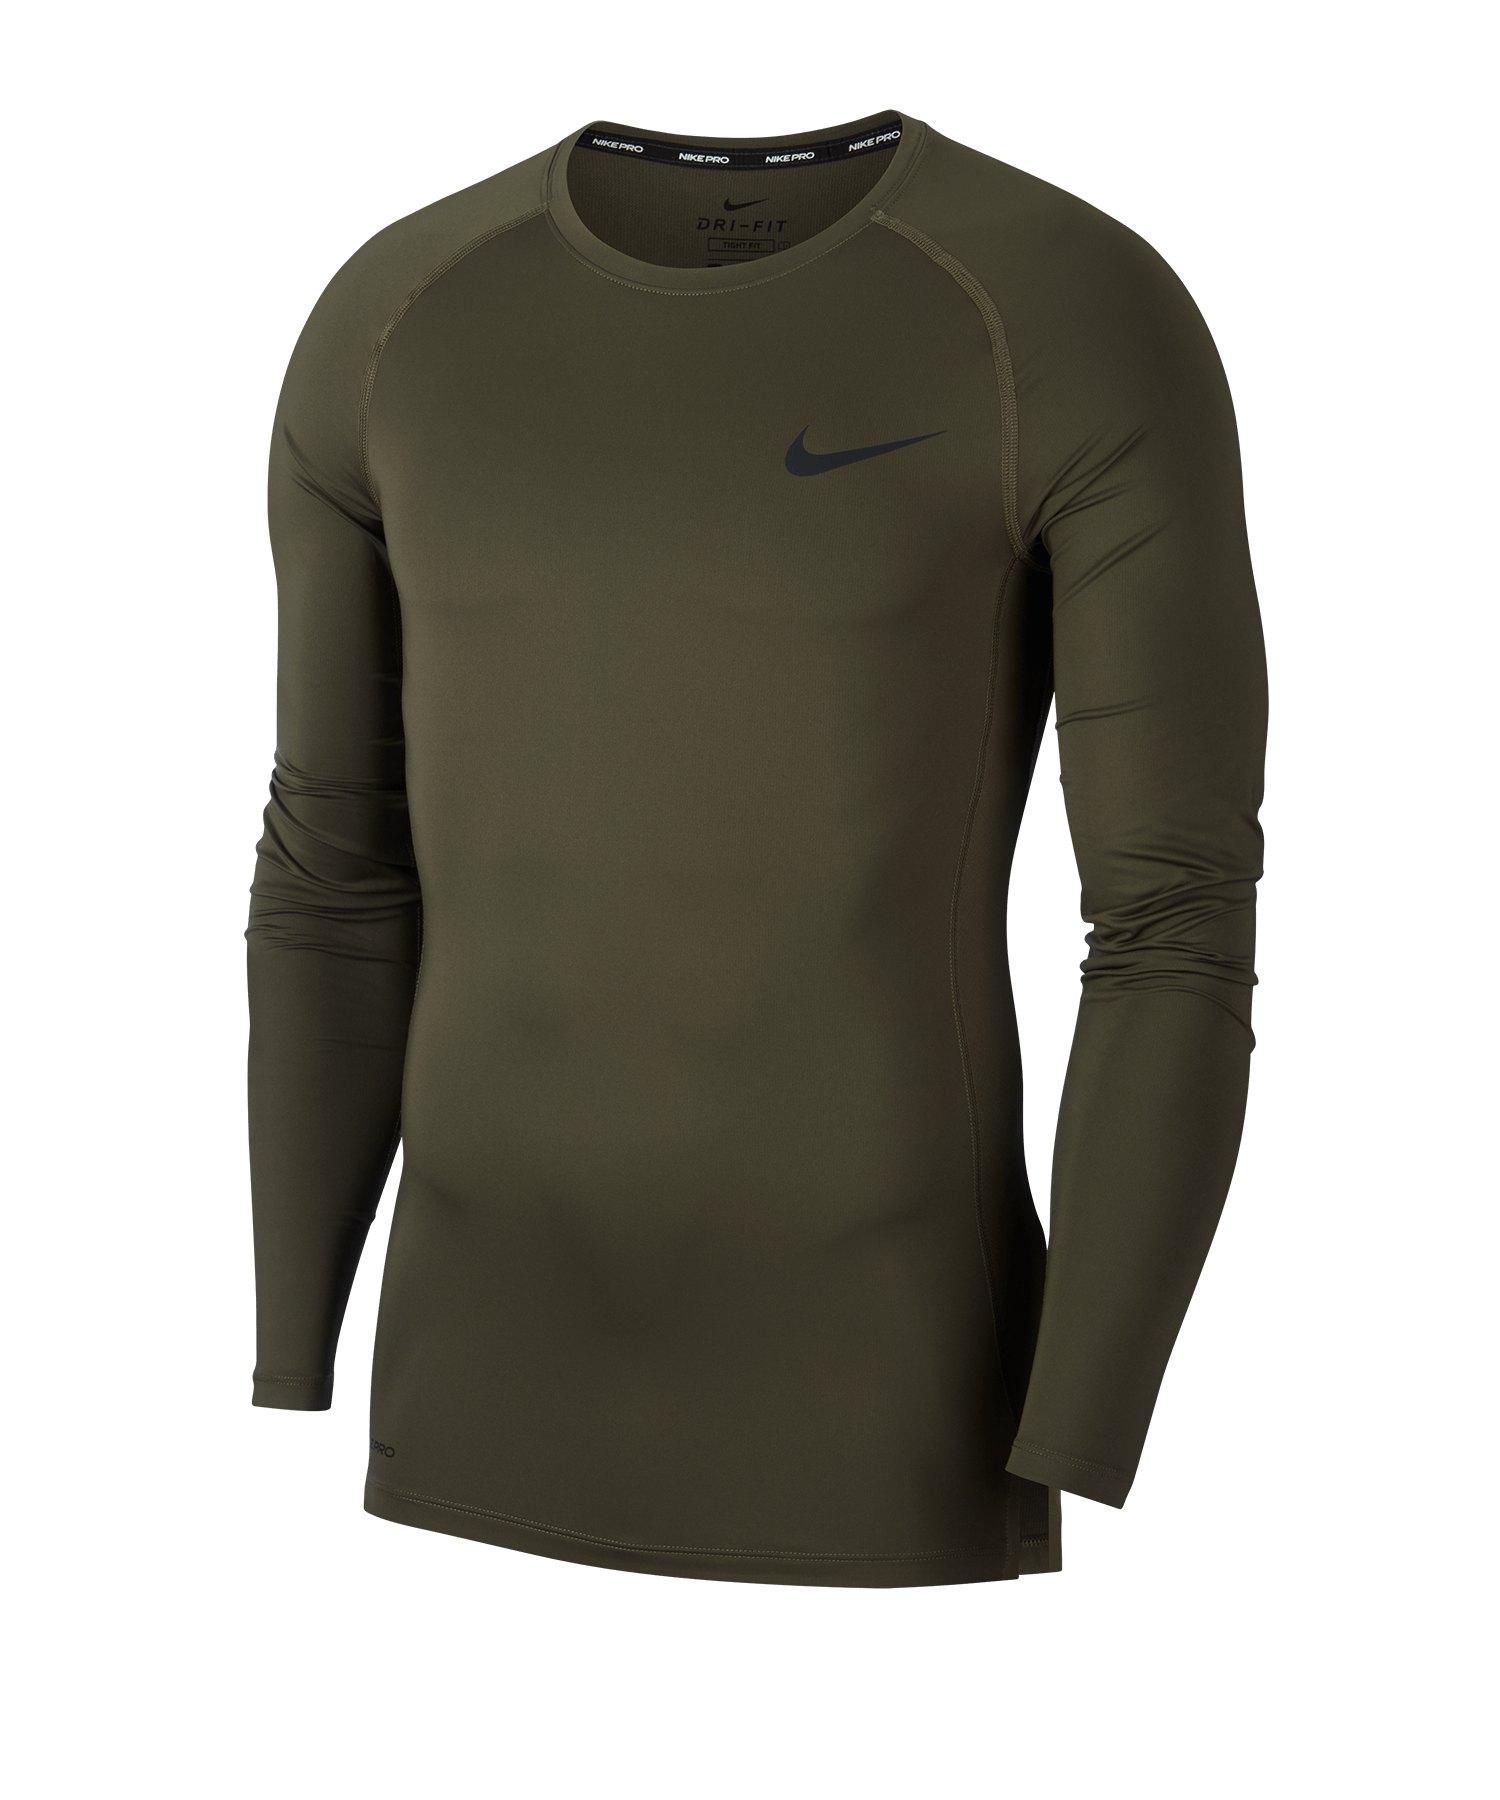 Nike Pro Shirt Longsleeve Grün F325 - gruen